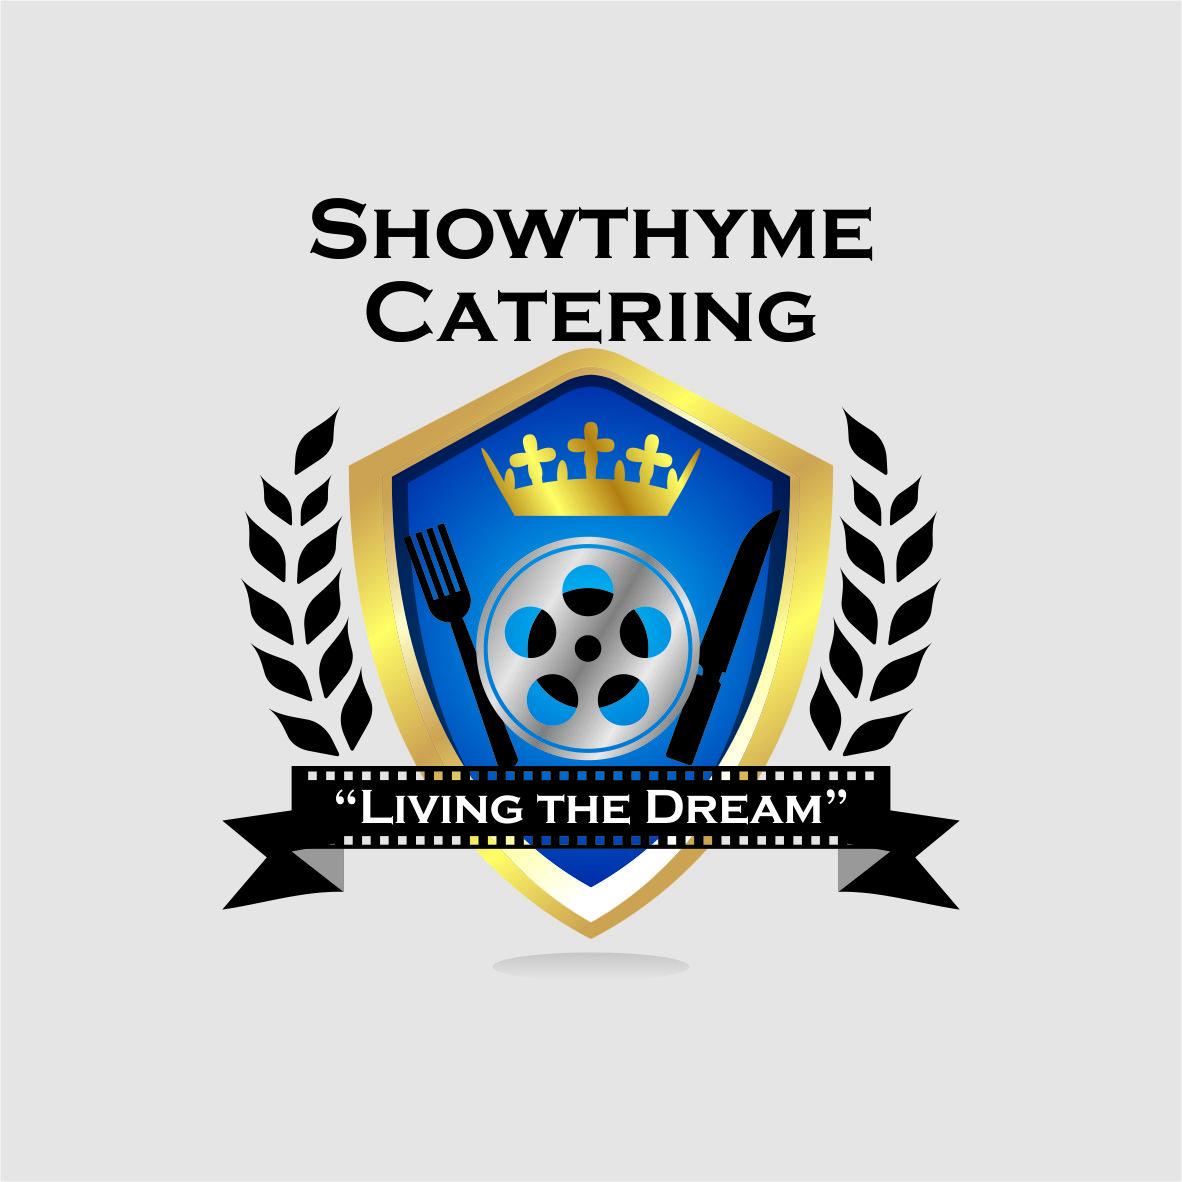 Logo Design by arteo_design - Entry No. 44 in the Logo Design Contest Showthyme Catering Logo Design.